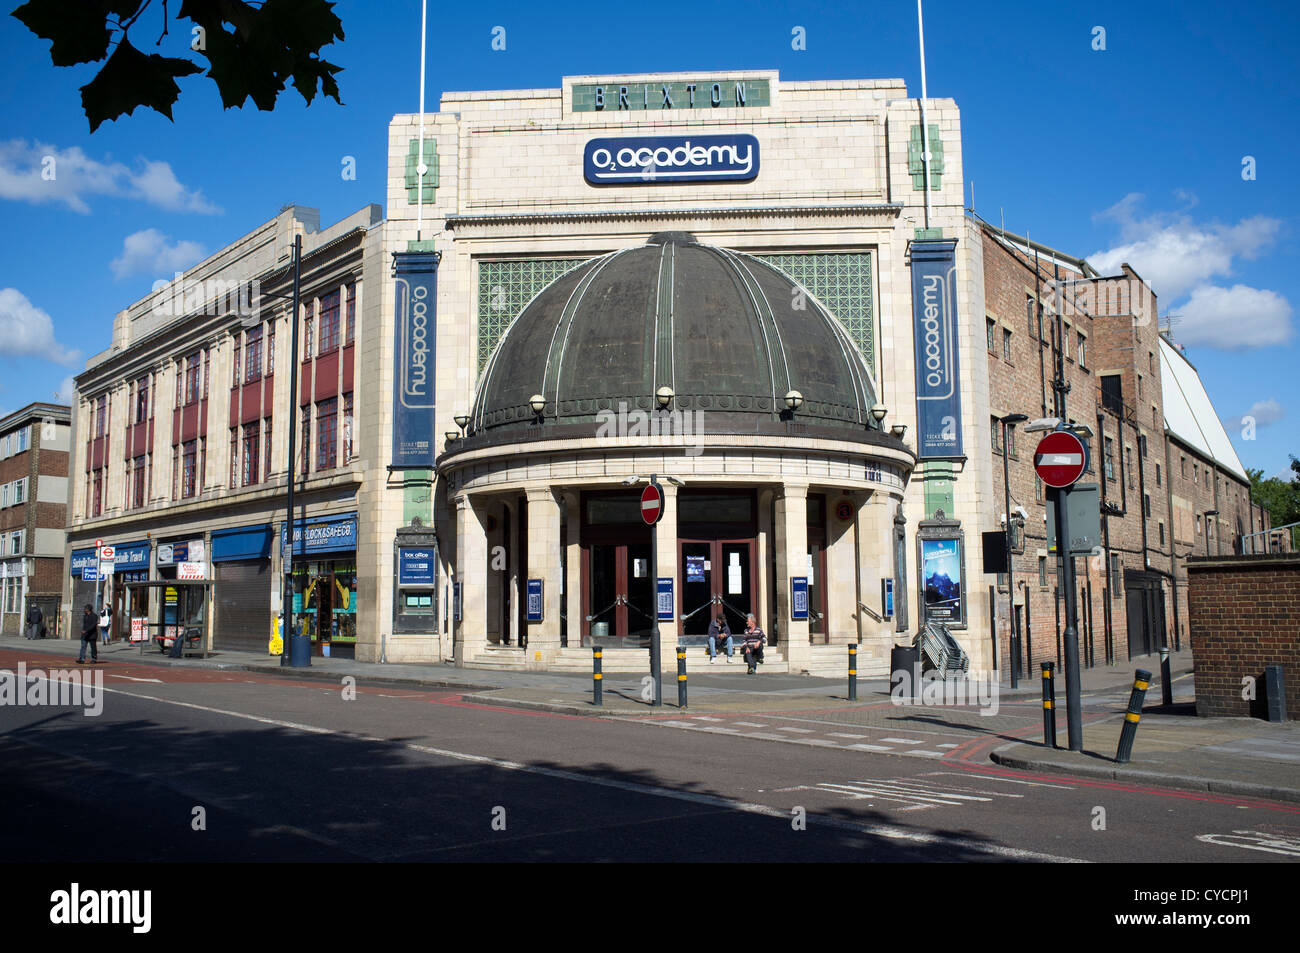 Brixton Academy London Stock Photo